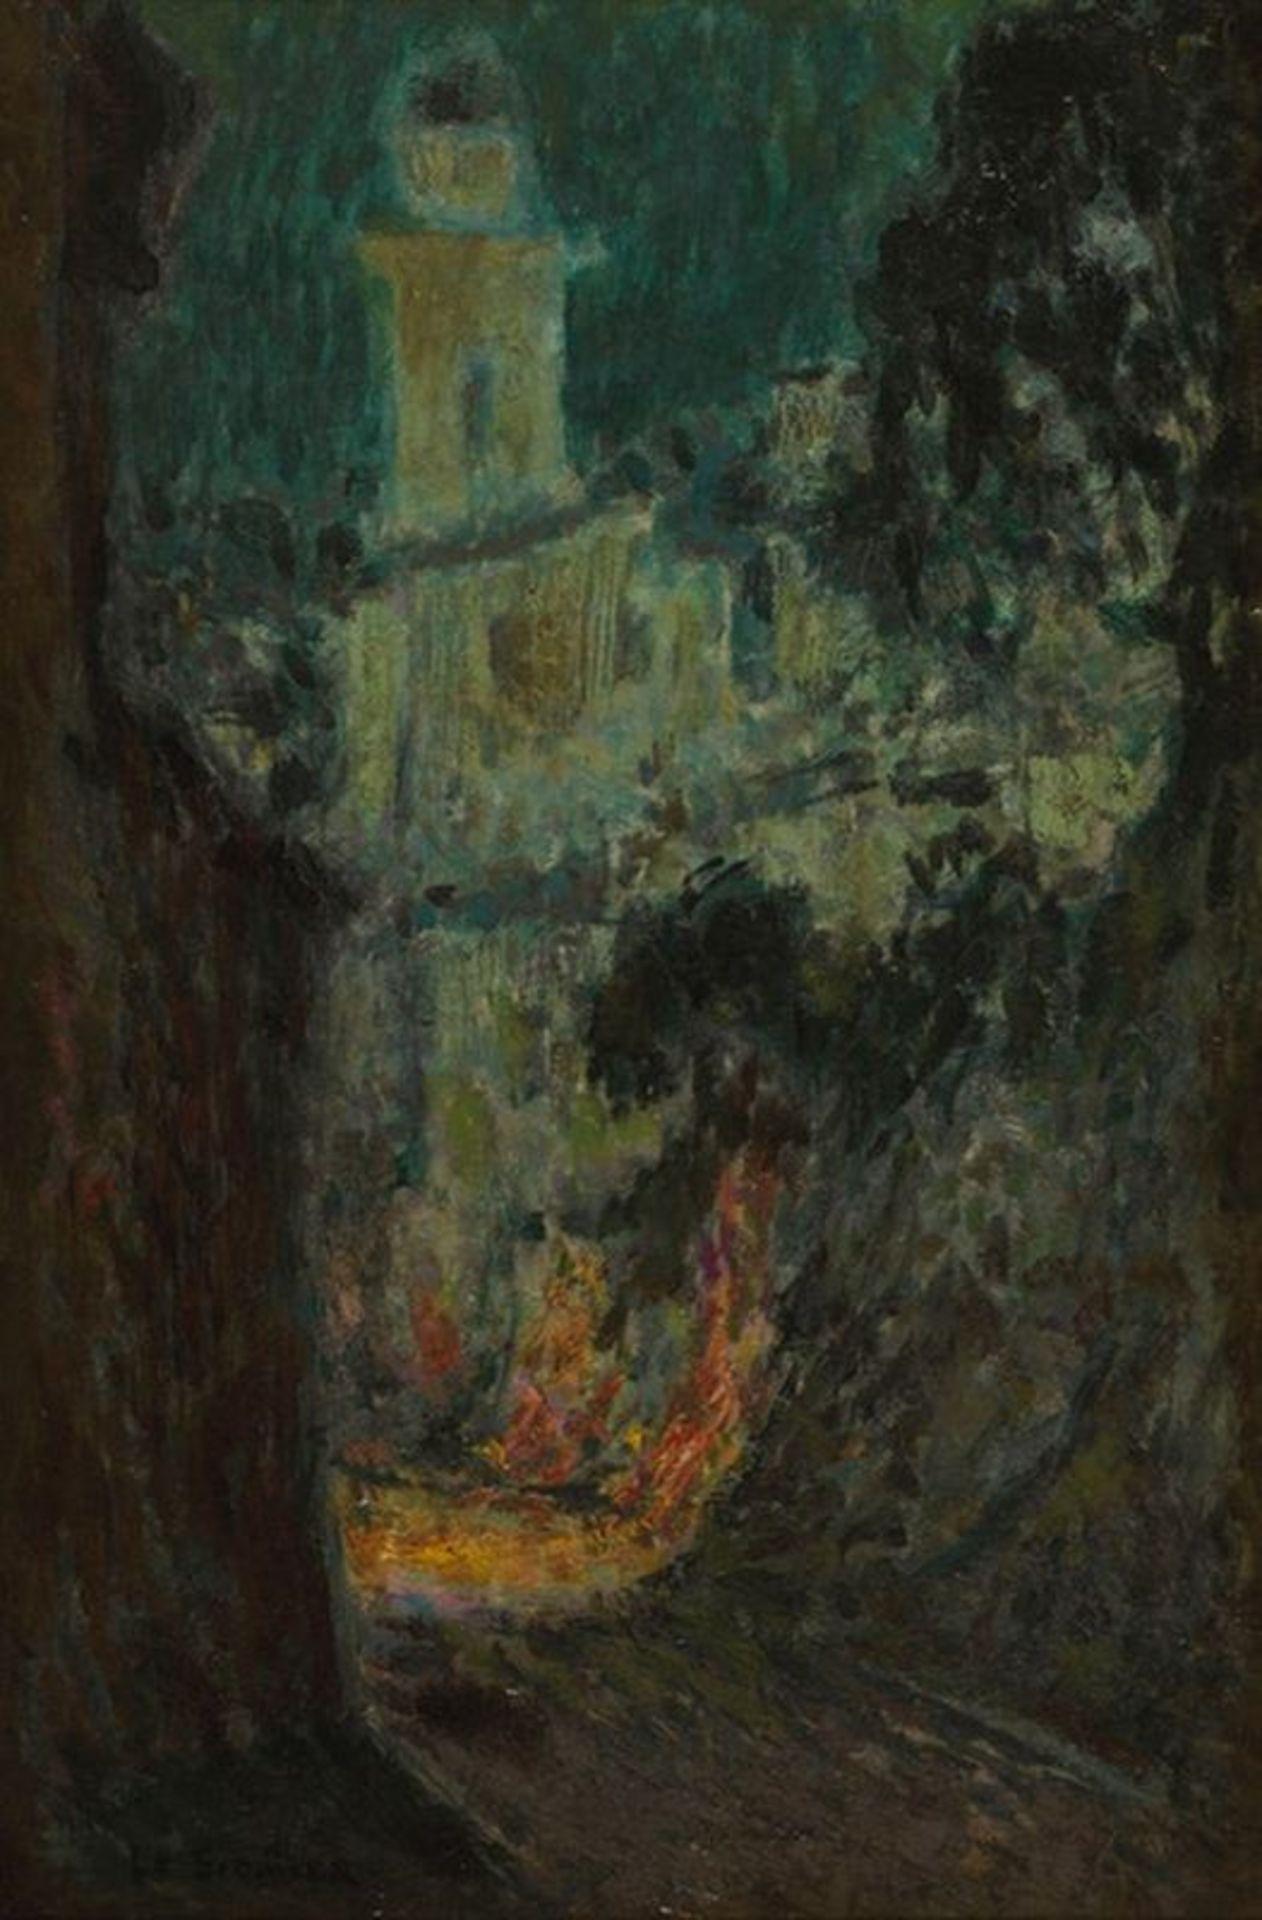 Los 508 - HENRI LE SIDANER (1862-1939) La rue au clair de lune, Villefranche-sur-Mer - [...]